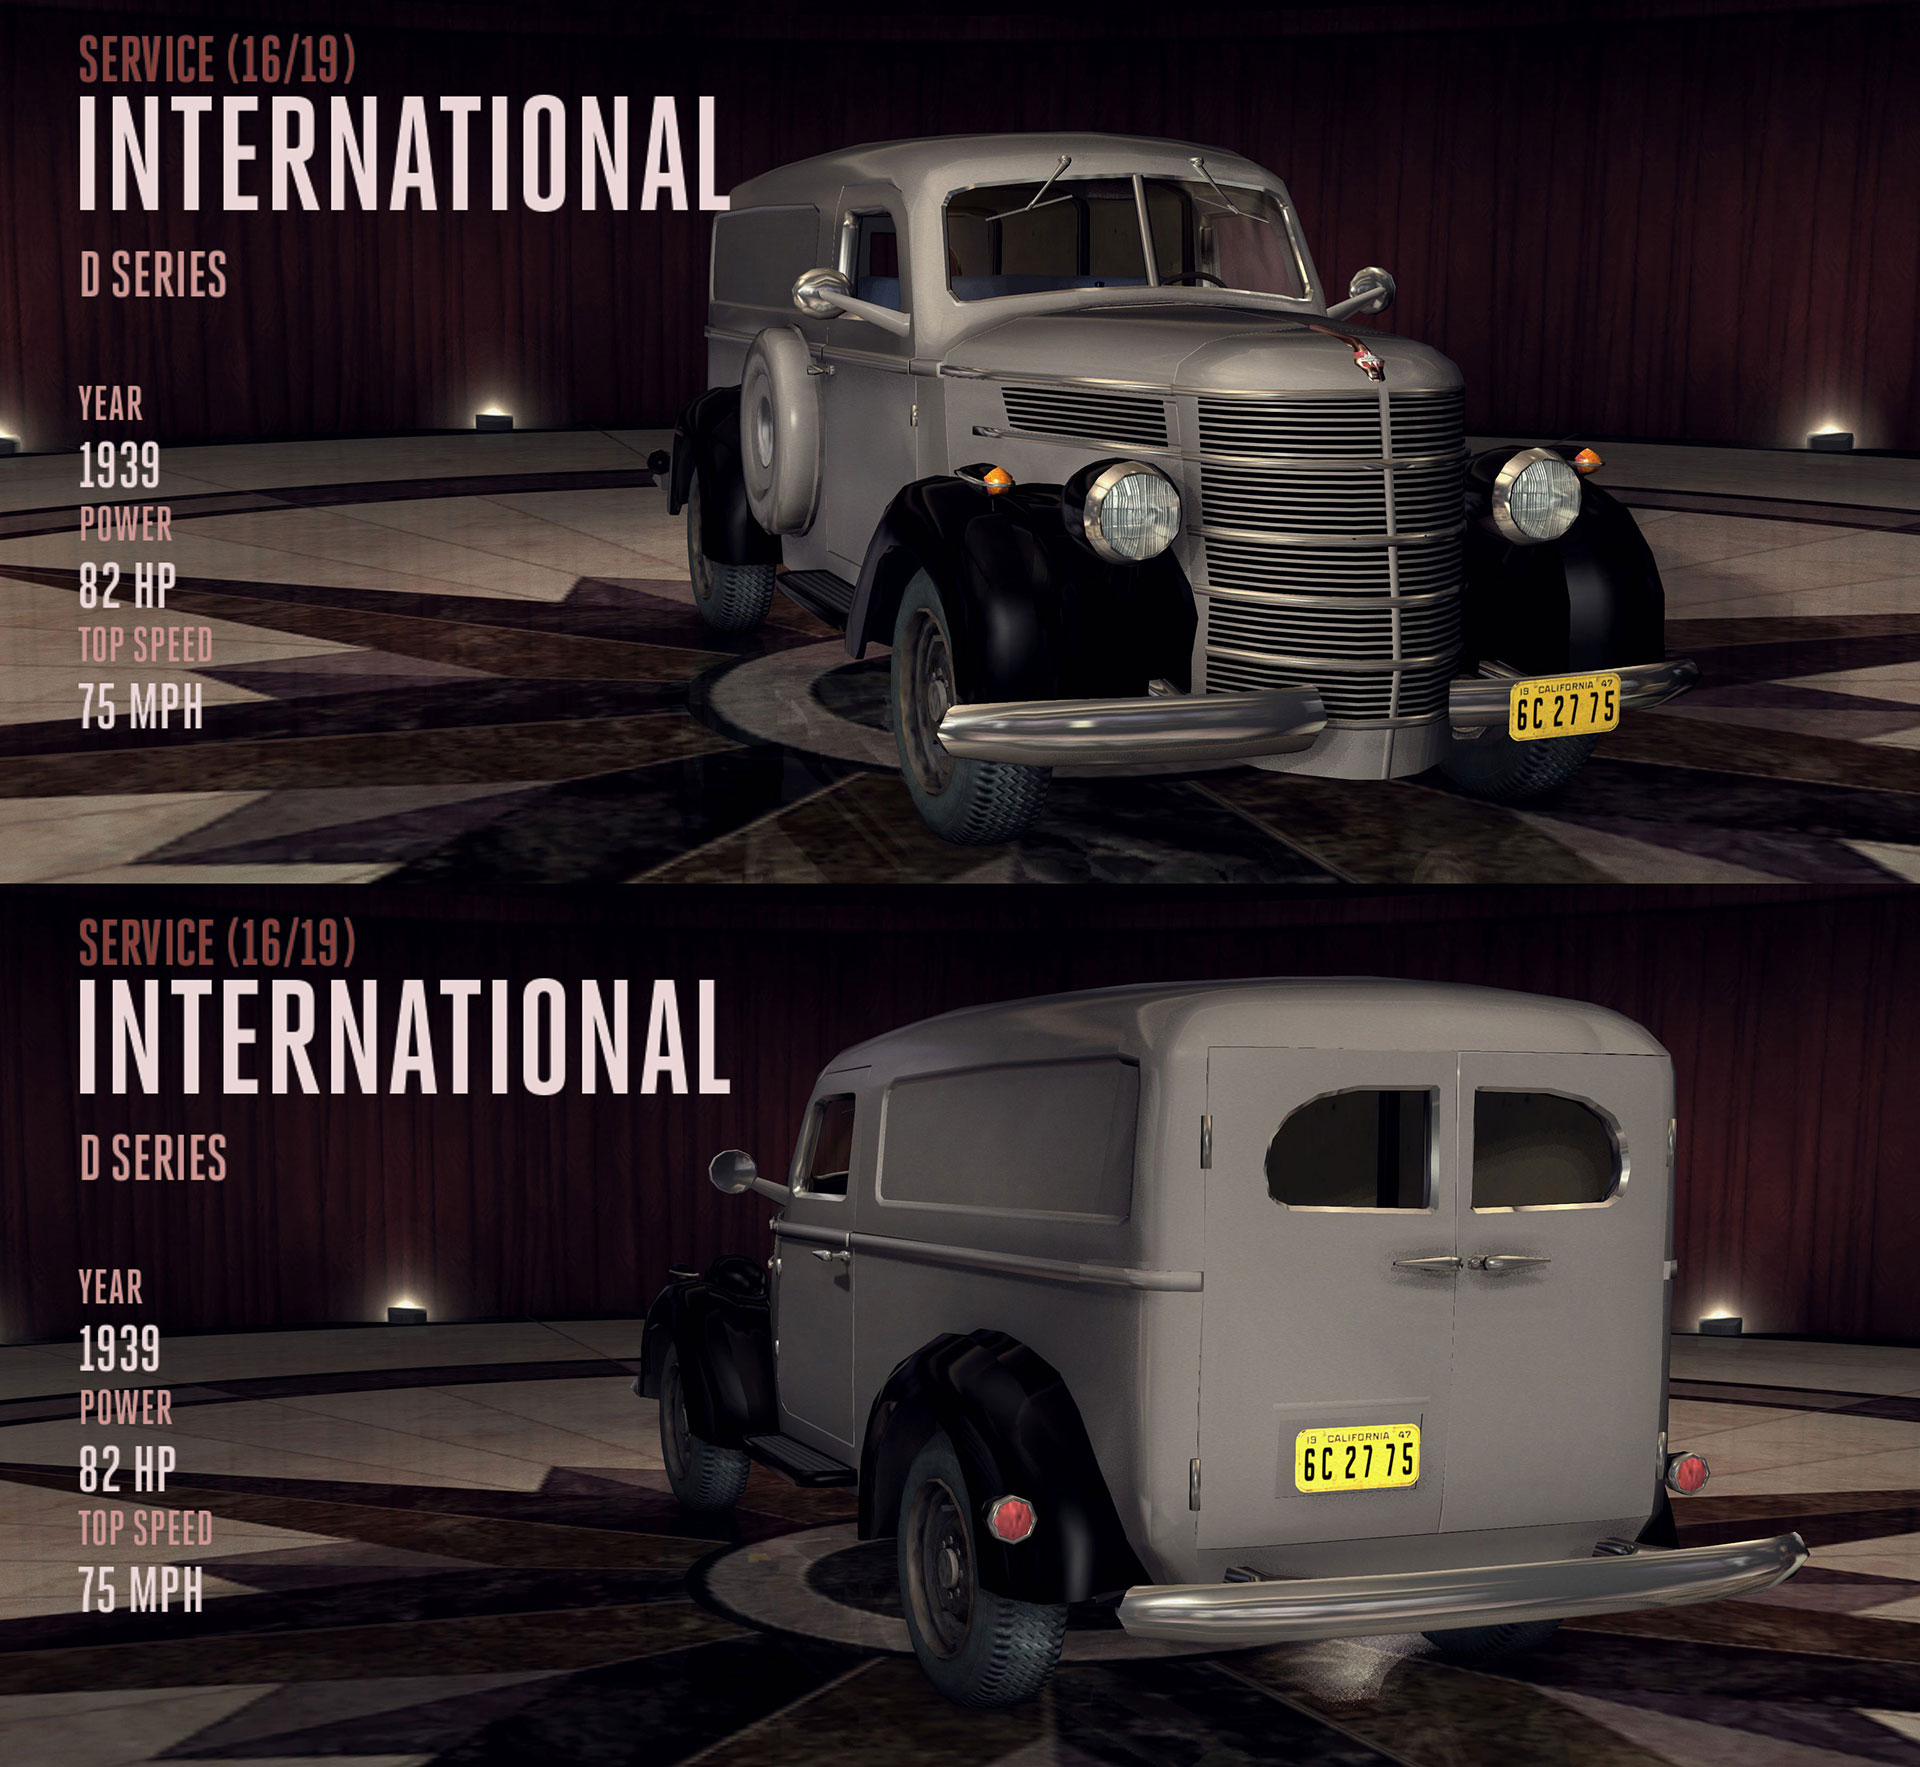 Archivo:1939-international-d-series.jpg